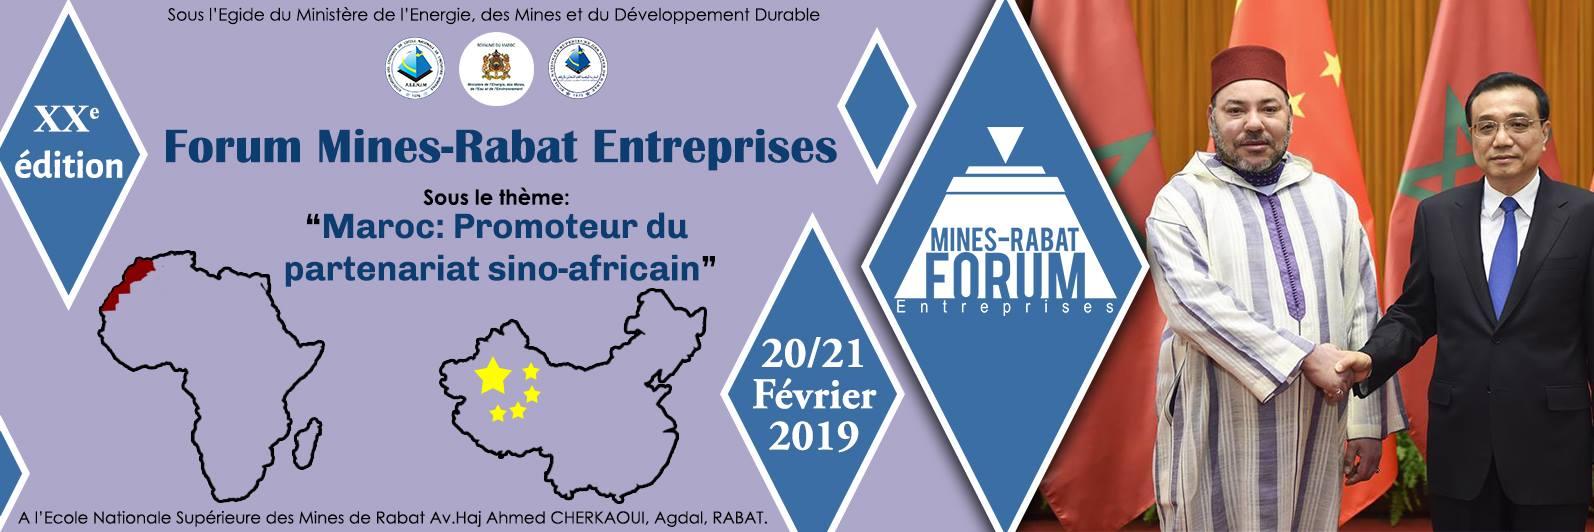 Forum Mines Rabat